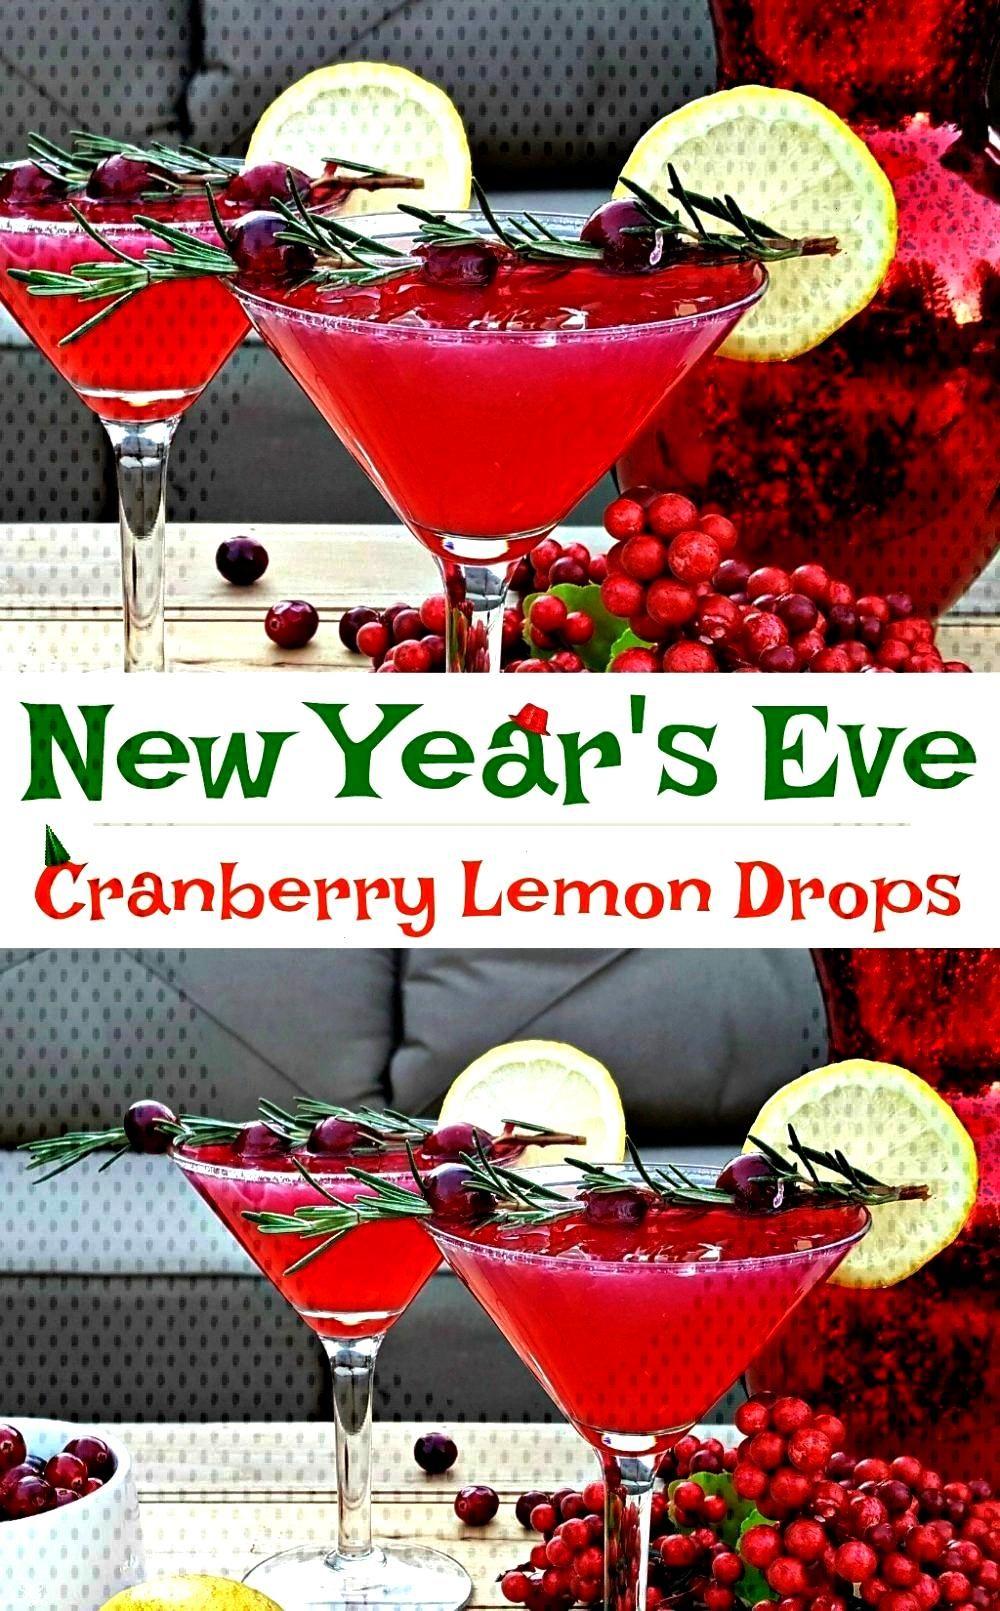 Years Drink Recipe - Cranberry Lemon Drop - New Year's Eve Drink Recipe! A cranberry lemon drop